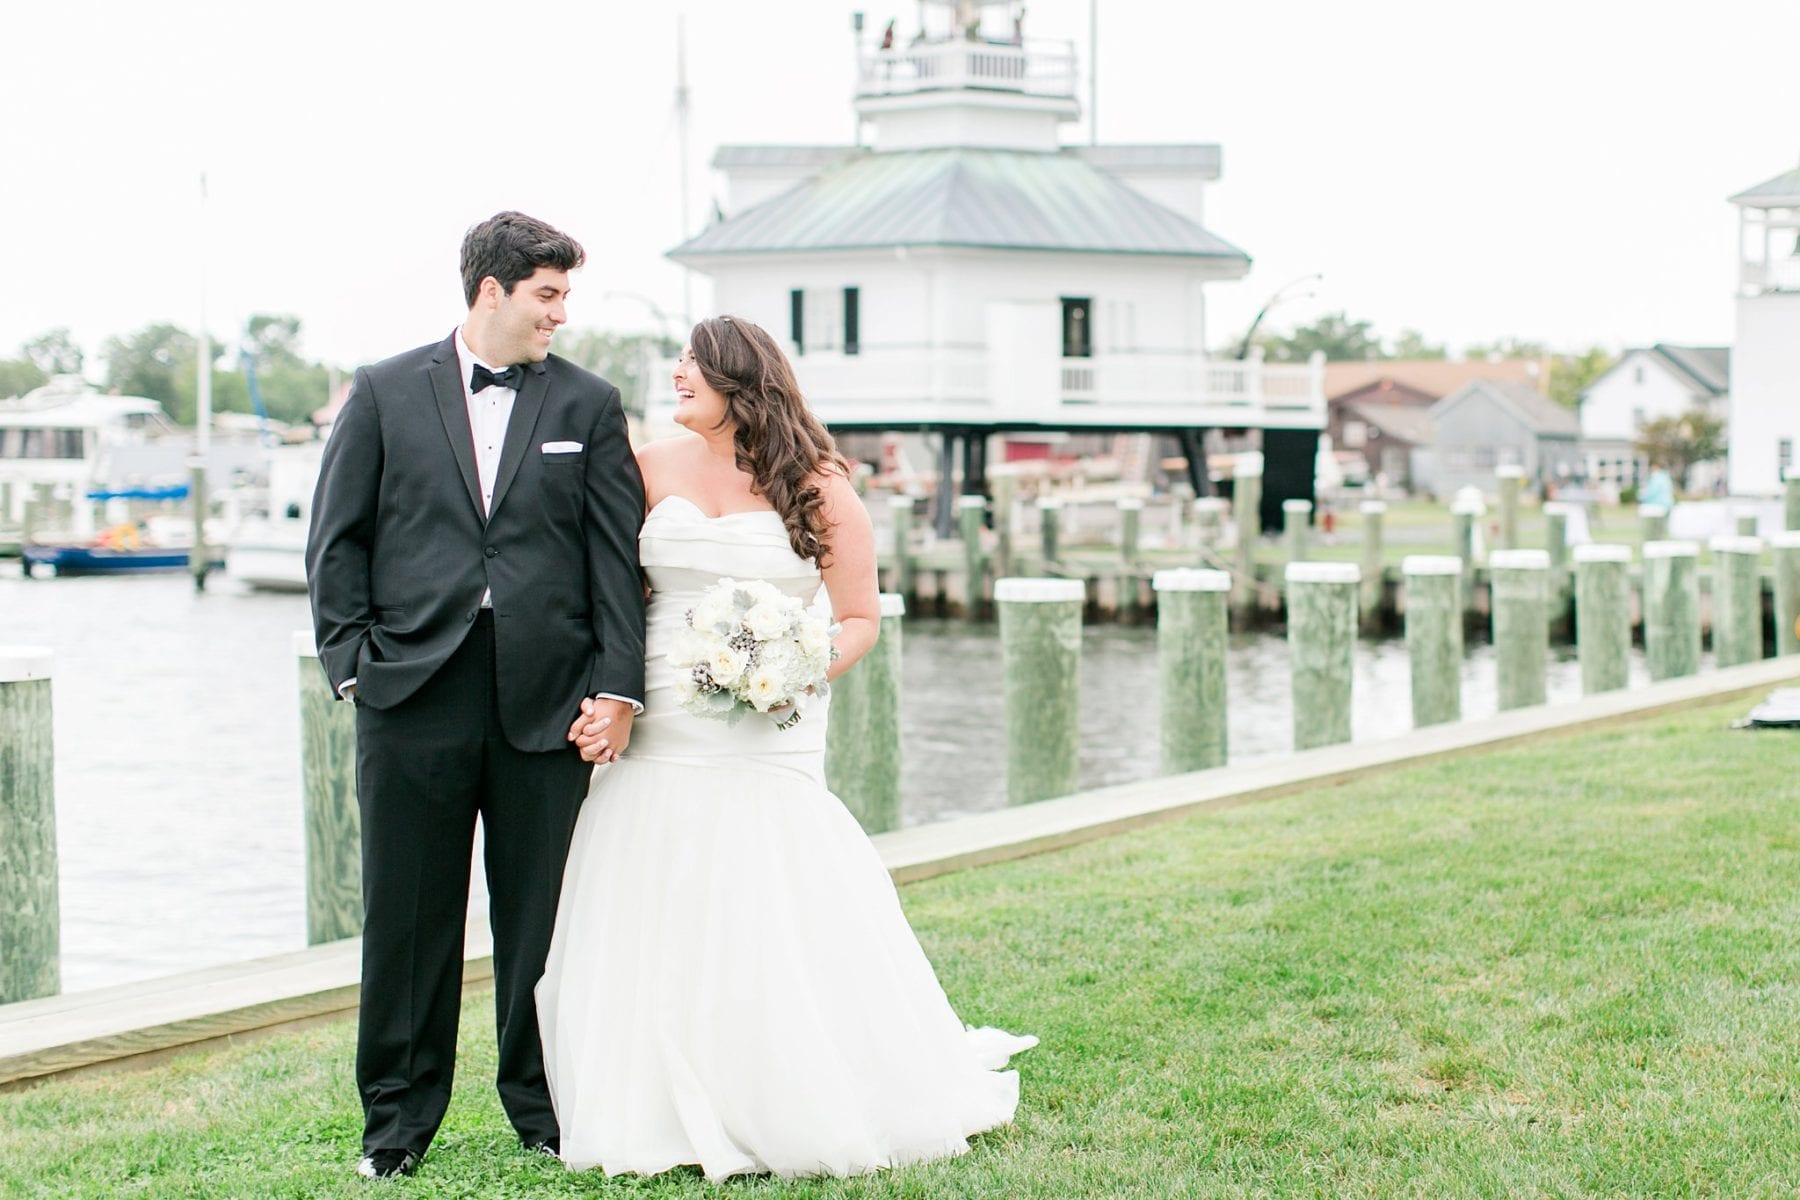 Chesapeake Bay Maritime Museum Wedding Photos Maryland Wedding Photographer Megan Kelsey Photography Halie & Mike-67.jpg